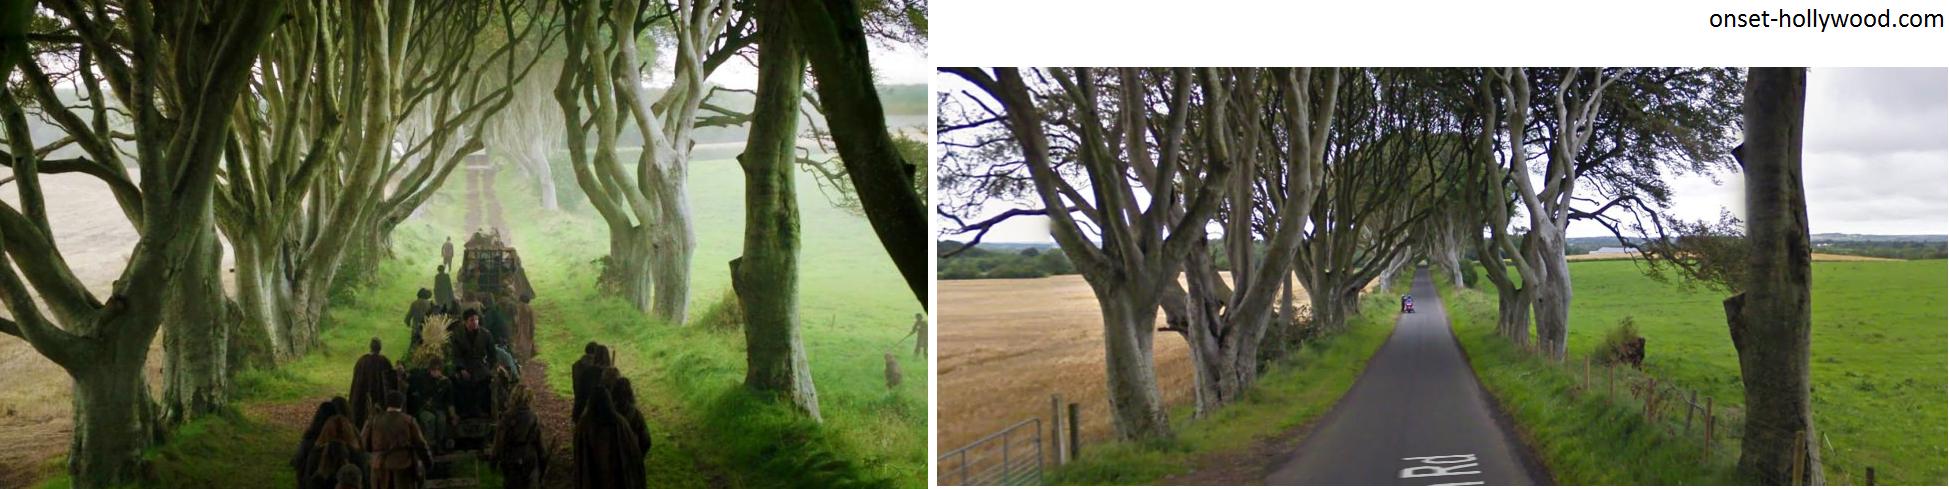 game-of-thrones-filming-locations-Dark-Hedges-ireland